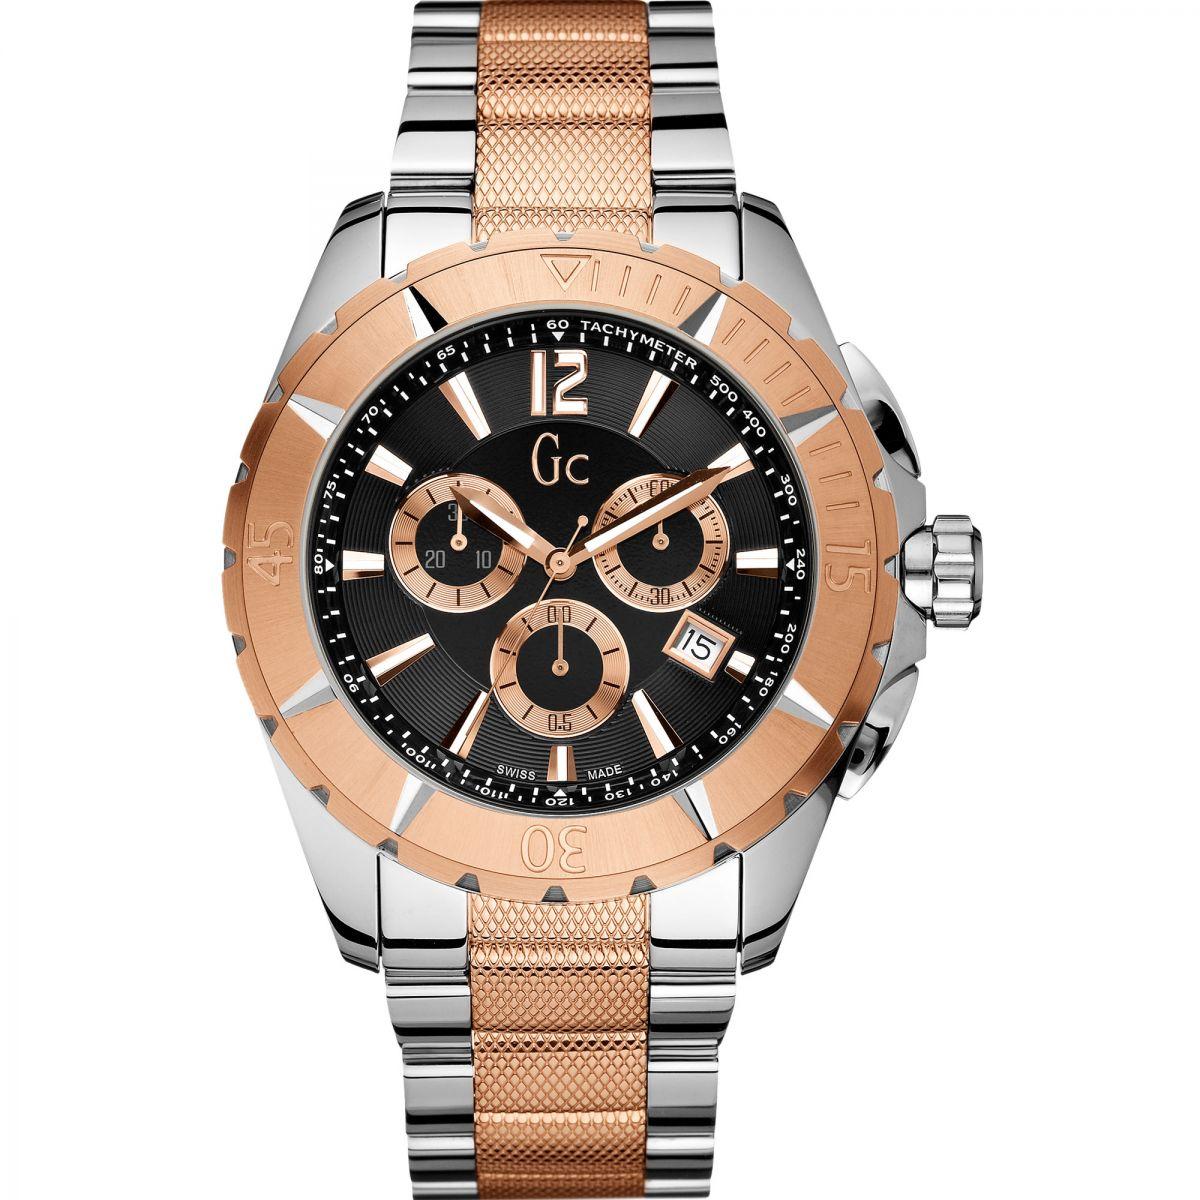 Gents Gc Sport Class XXL Chronograph Watch (X53003G2S) | WatchShop.com™